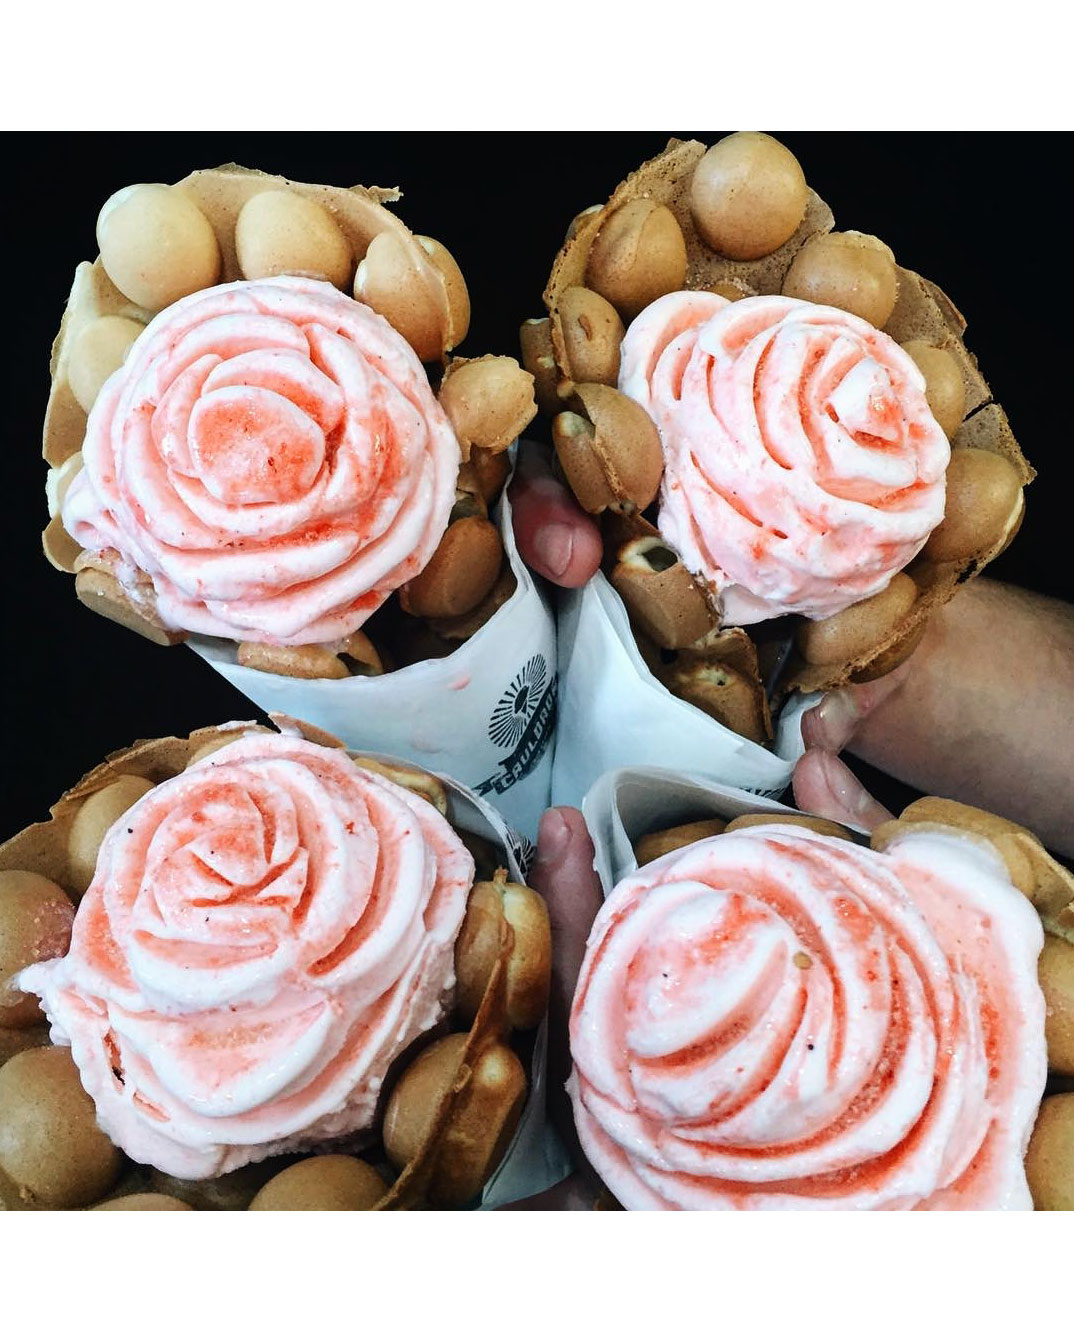 dessert-crazes-puffle-cone-0316.jpg